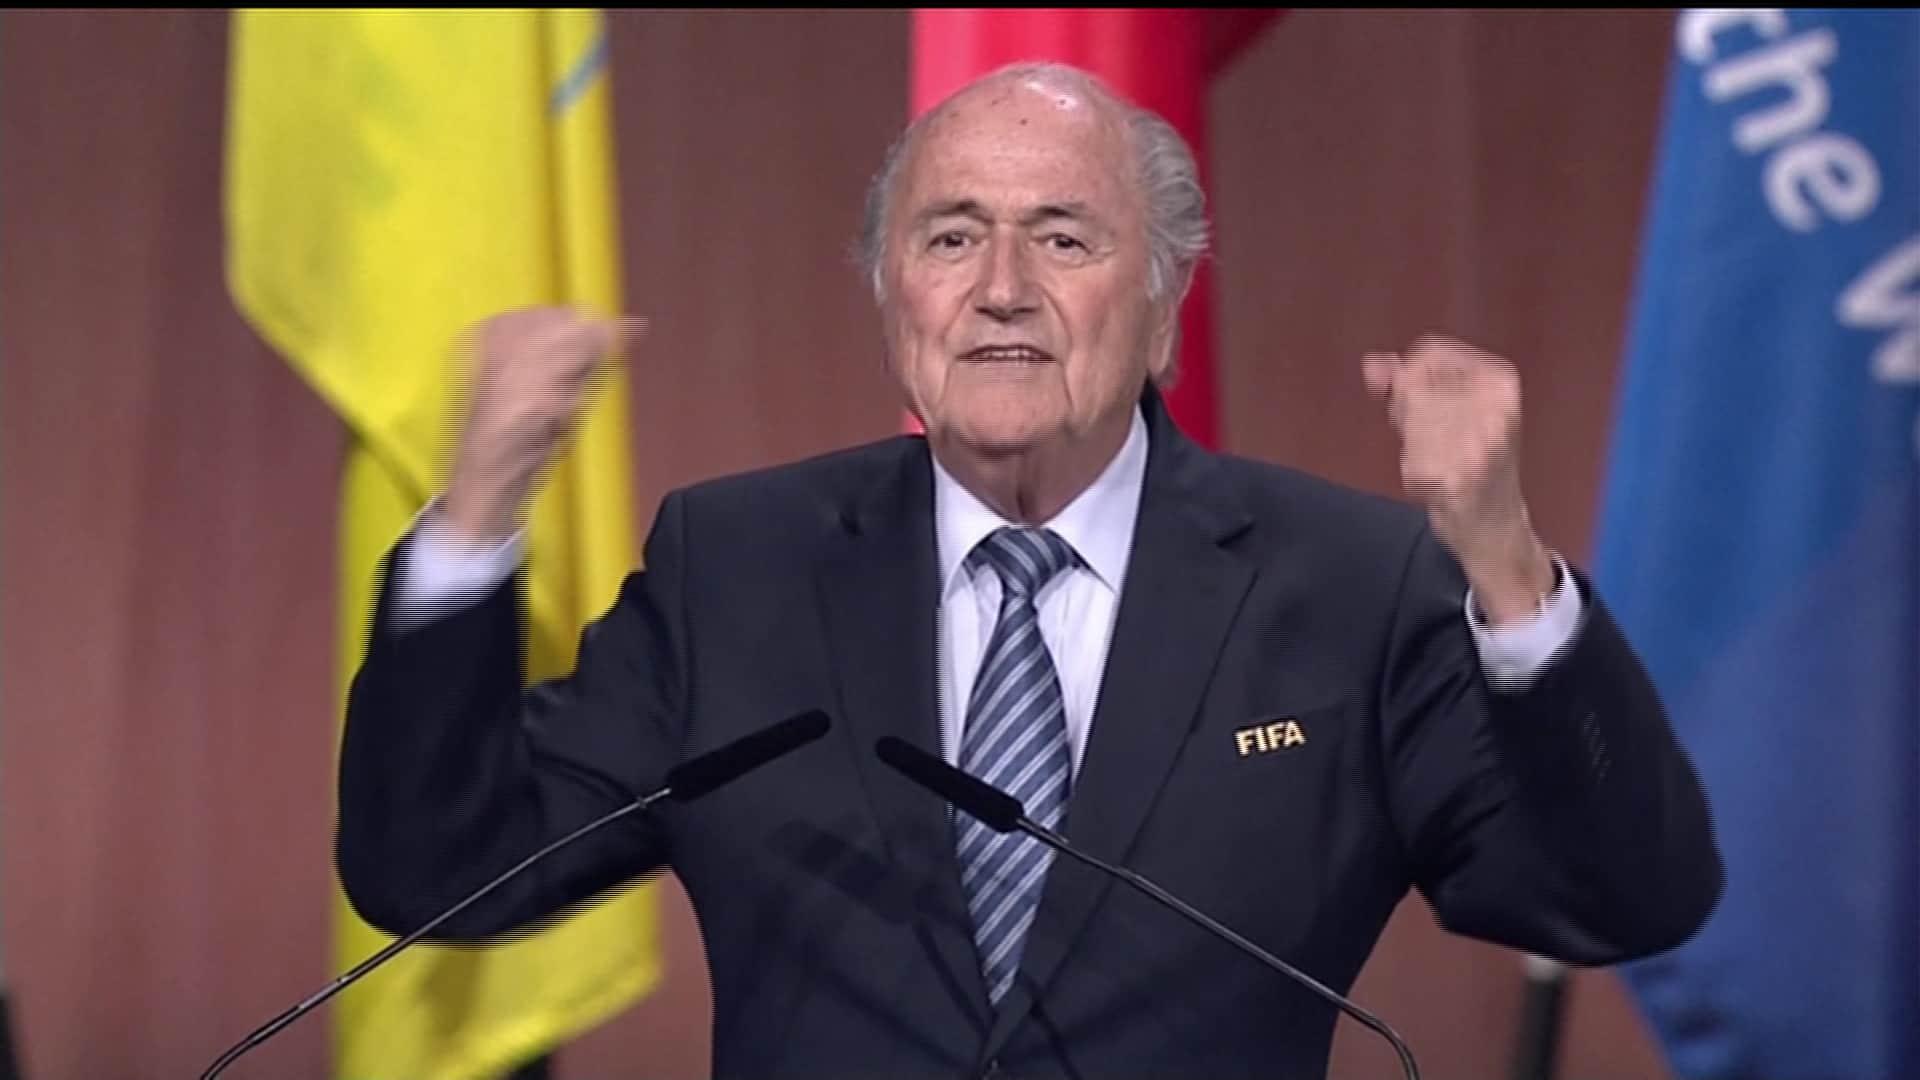 The National - Sepp Blatter holds on to power